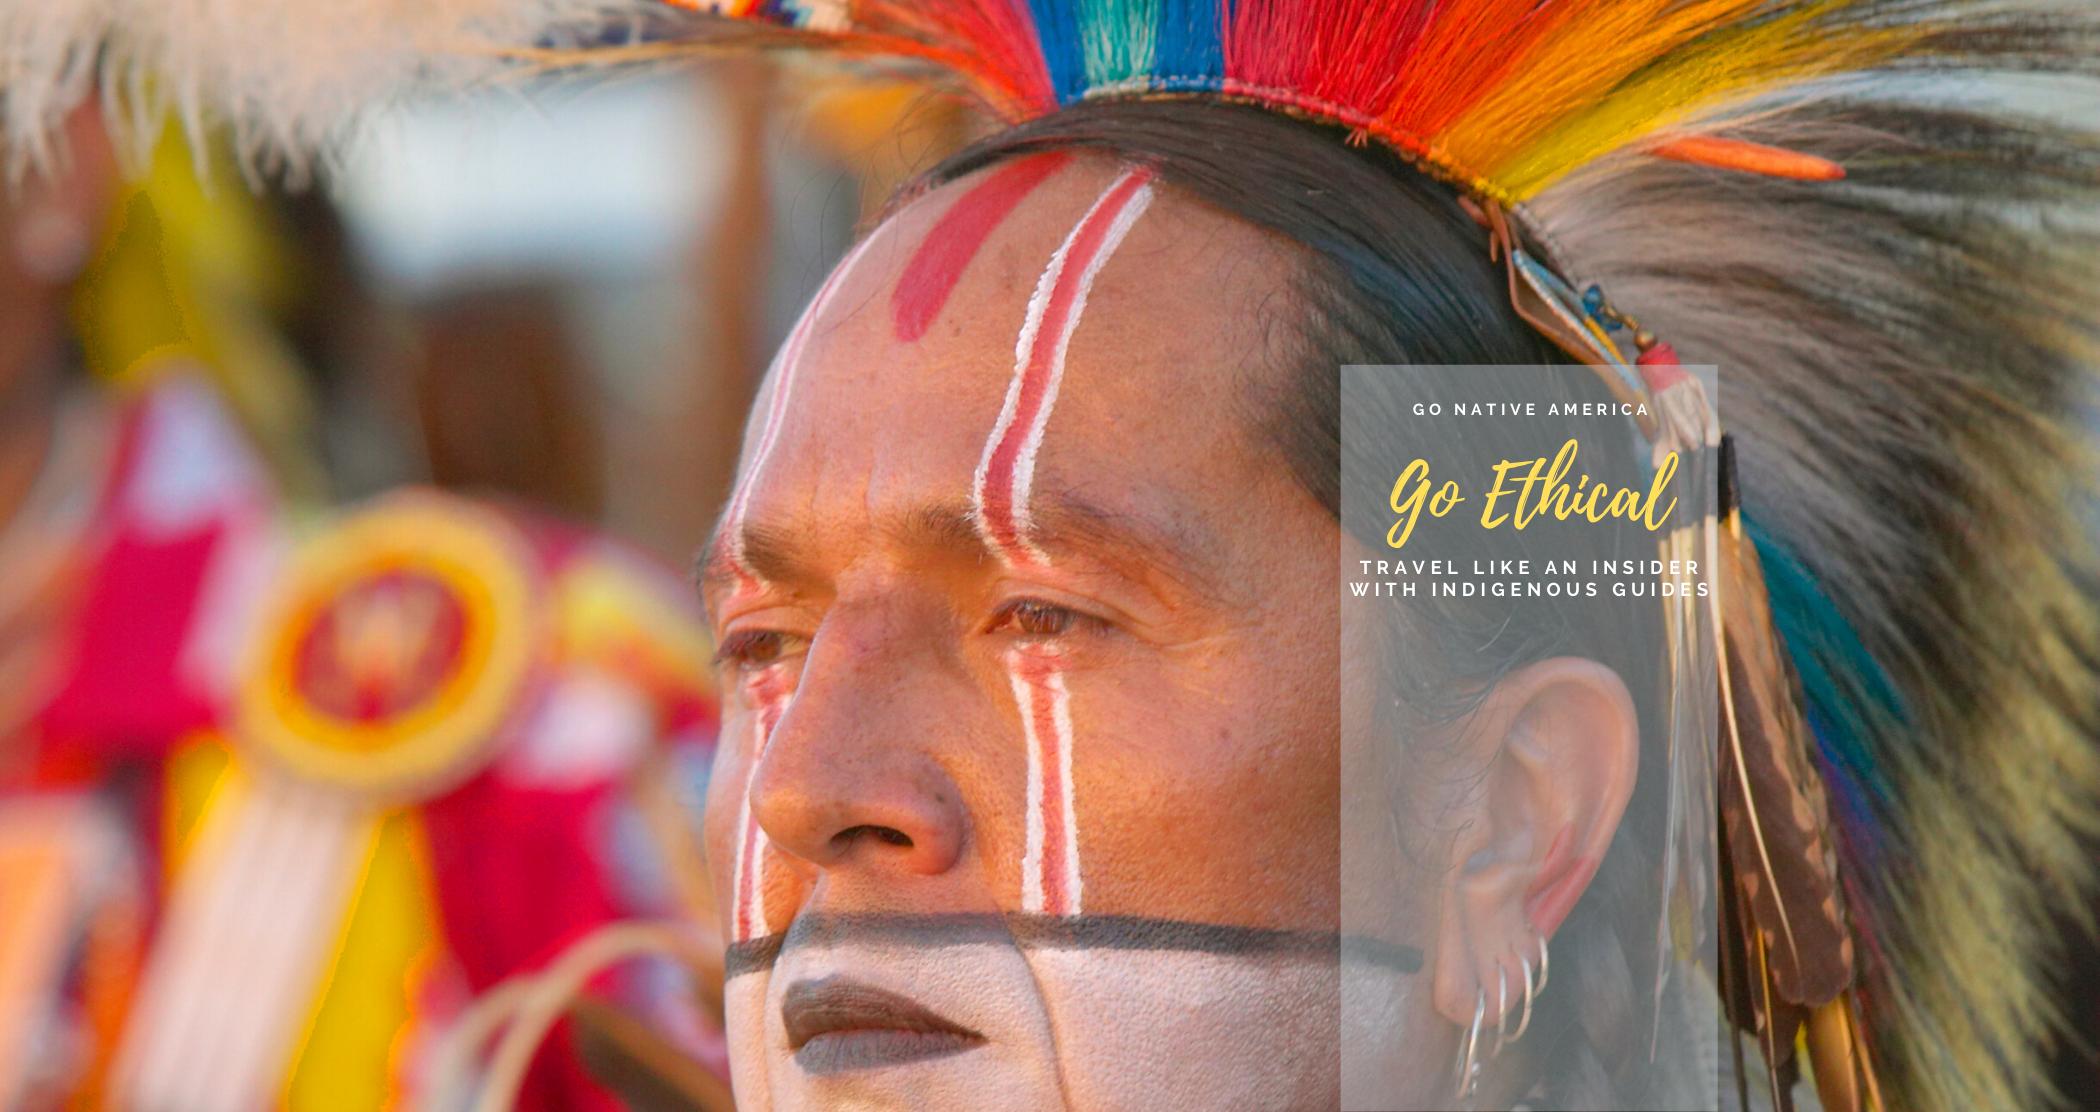 Go Native America - Go Ethical